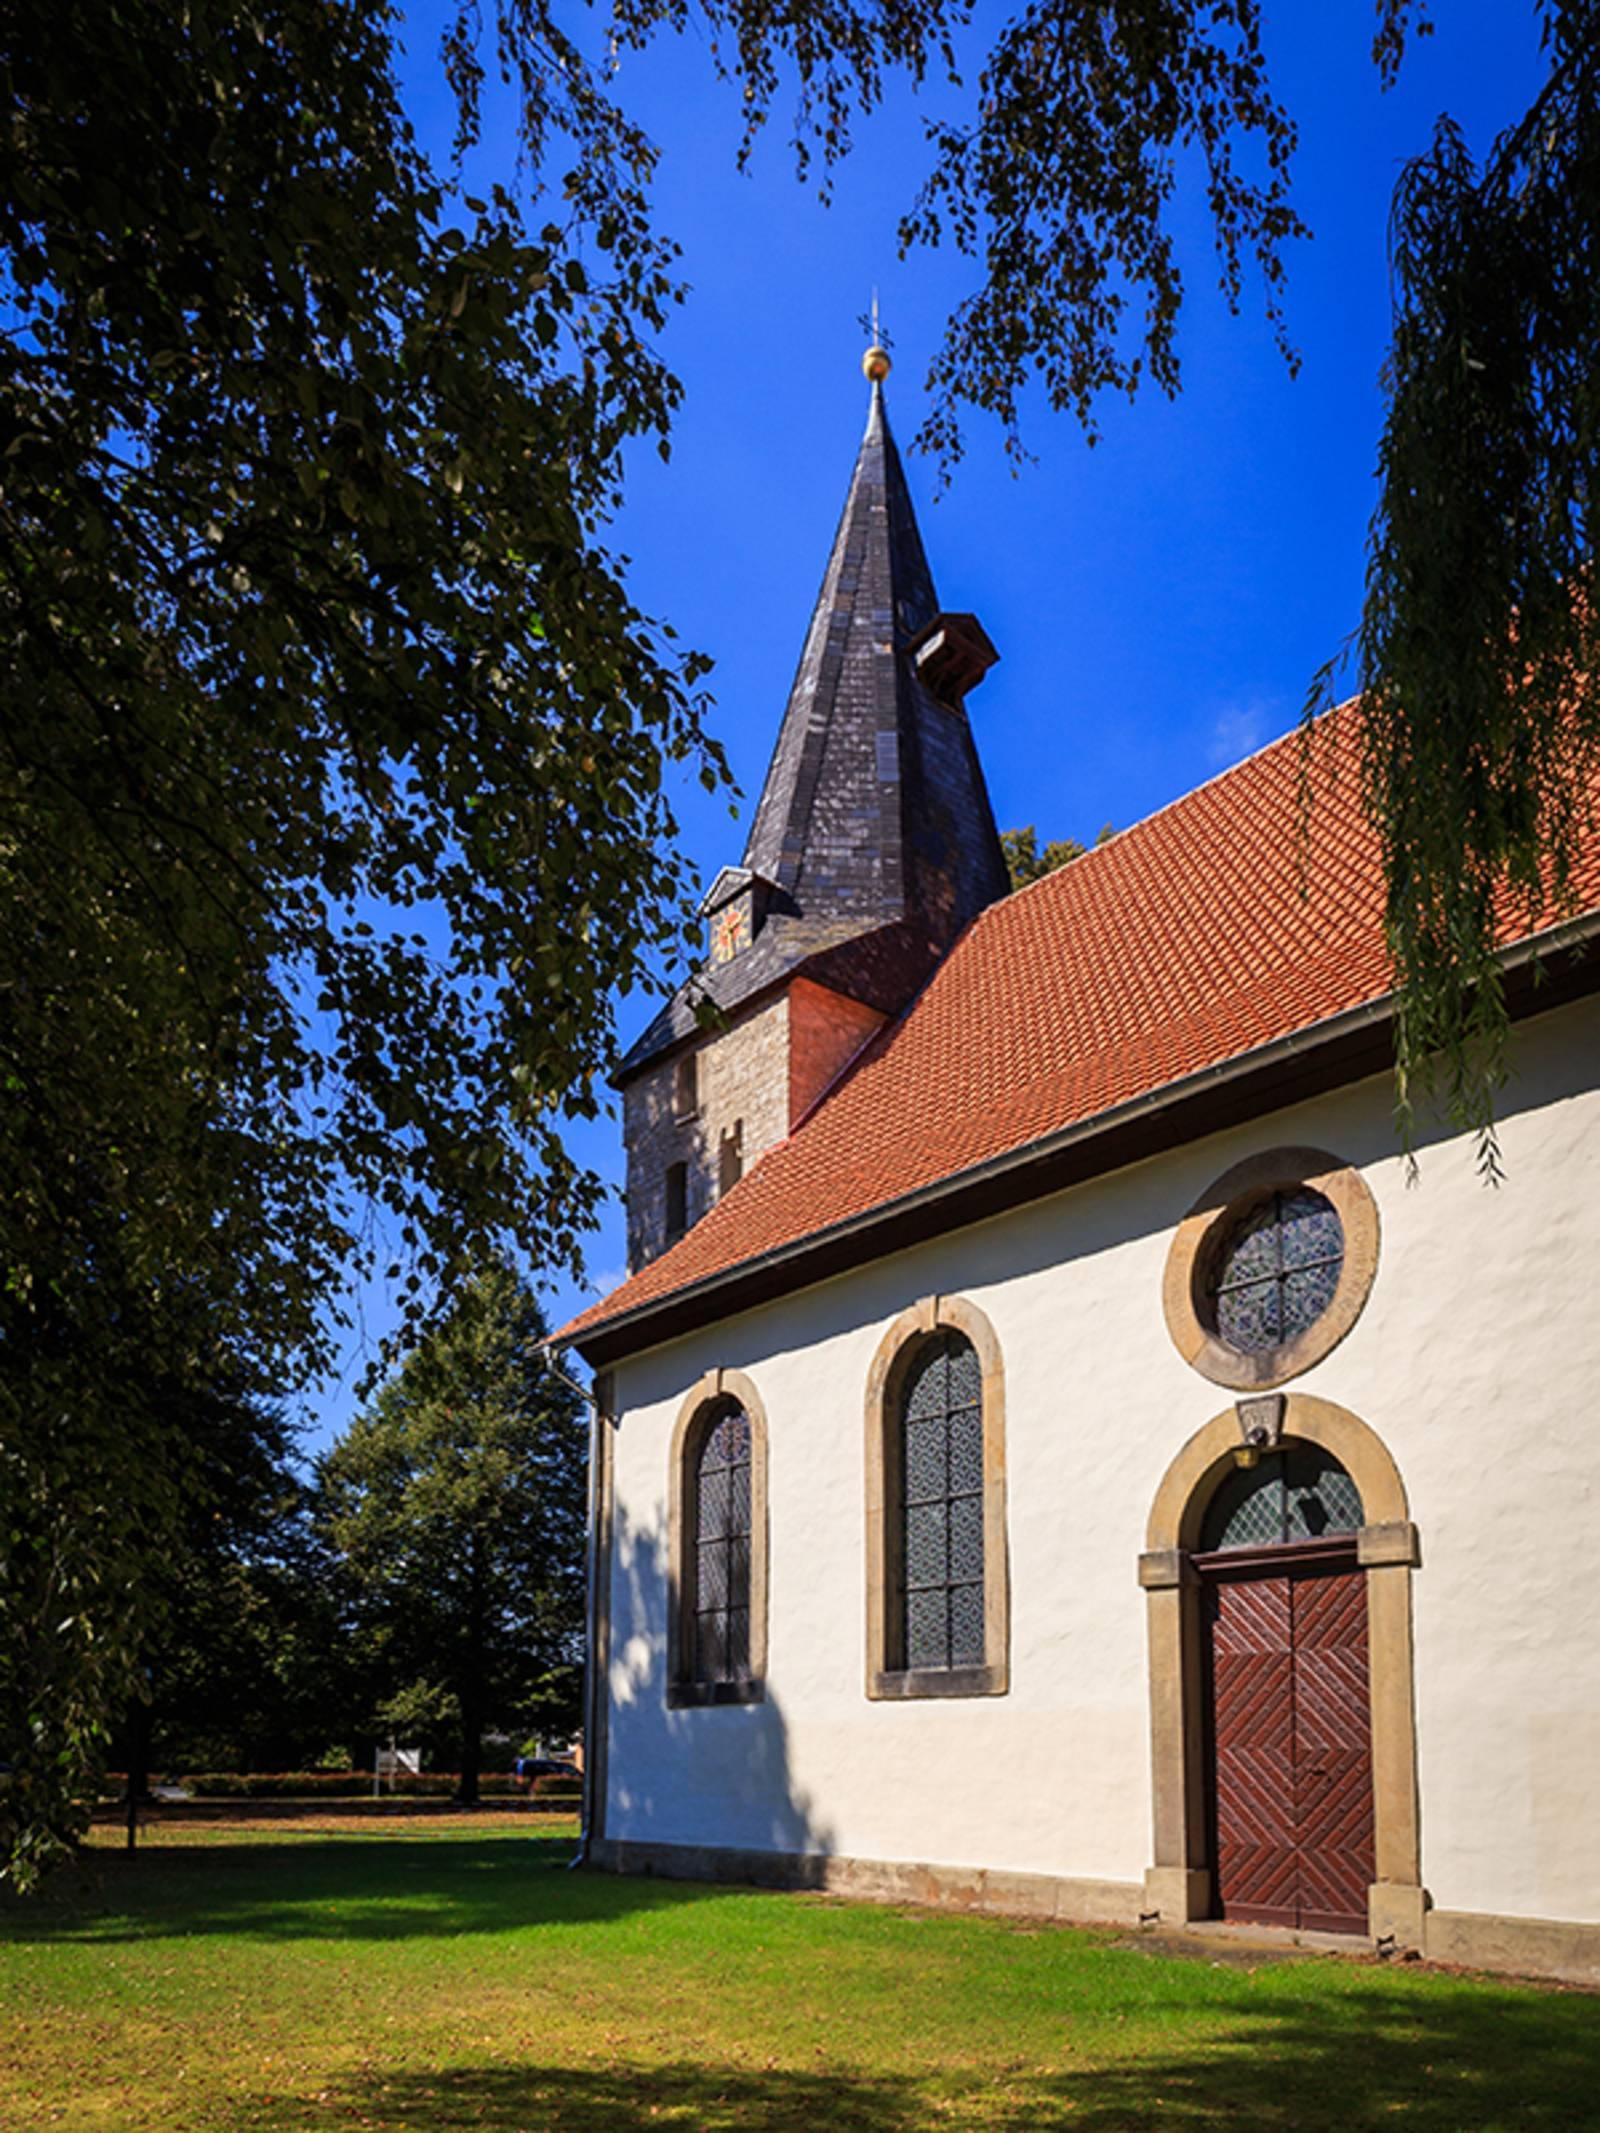 Barockkirche Ilten in Sehnde